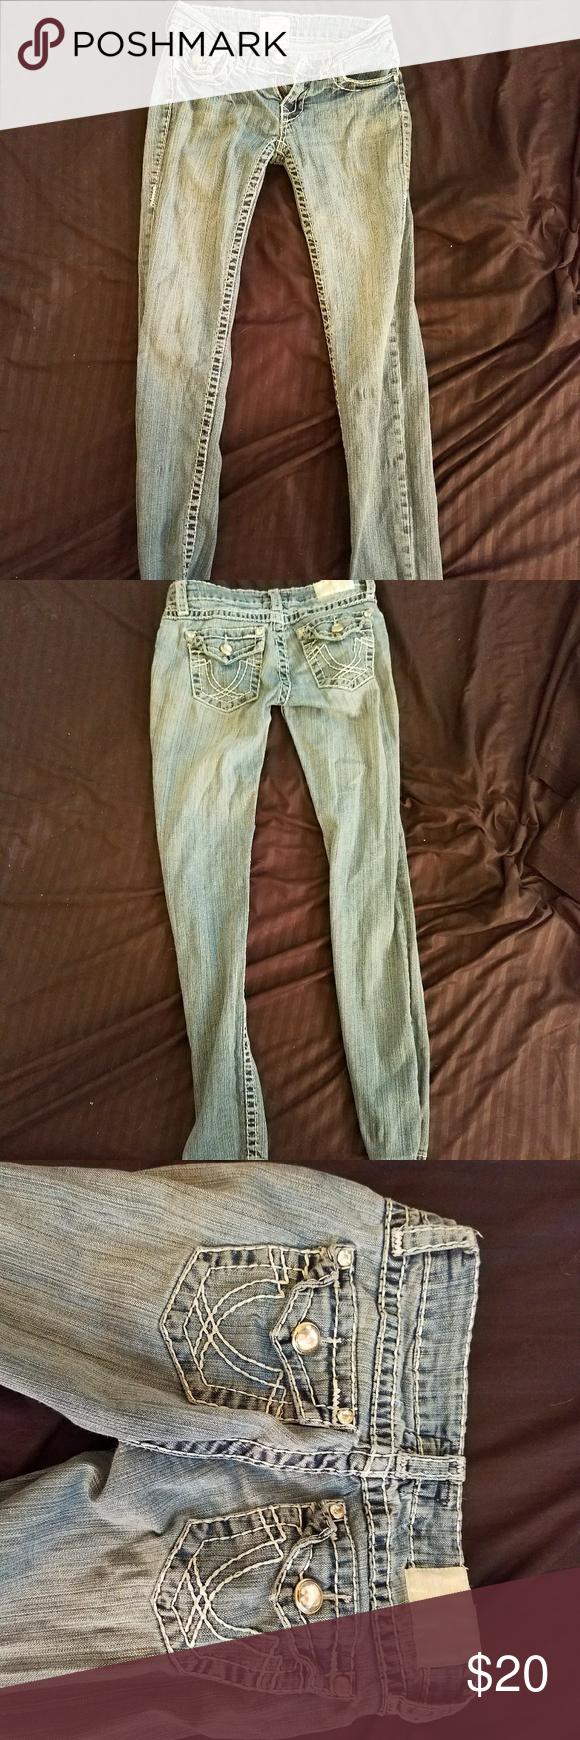 LA Idol Skinny Jeans LA Idol light wash skinny jeans. Size 3 but fits like a 0. No rips or holes. LA Idol  Jeans Skinny